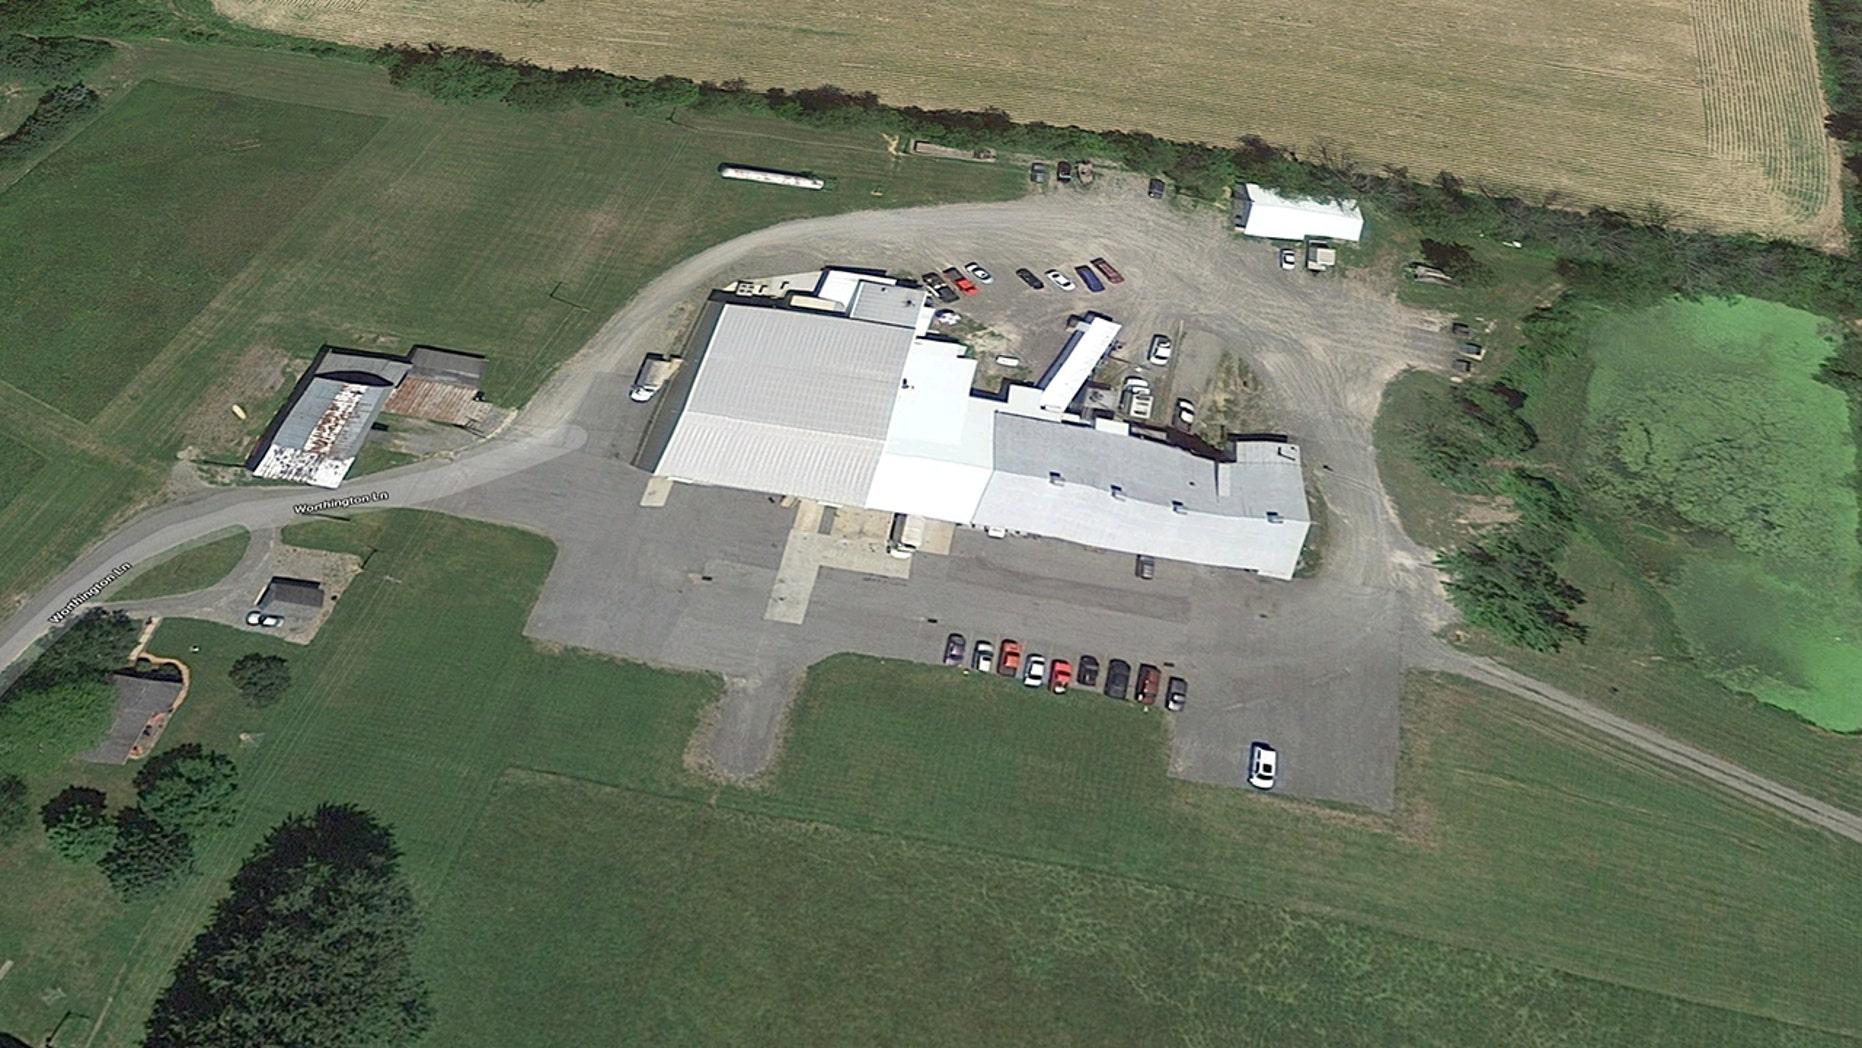 Westlake Legal Group Economy-Locker-Storage-Company Pennsylvania woman killed following 'horrible' meat grinder incident: official fox-news/us/us-regions/northeast/pennsylvania fox news fnc/us fnc Elizabeth Zwirz article 6d6c8ec7-032d-56e4-94c9-cad3395f14b7